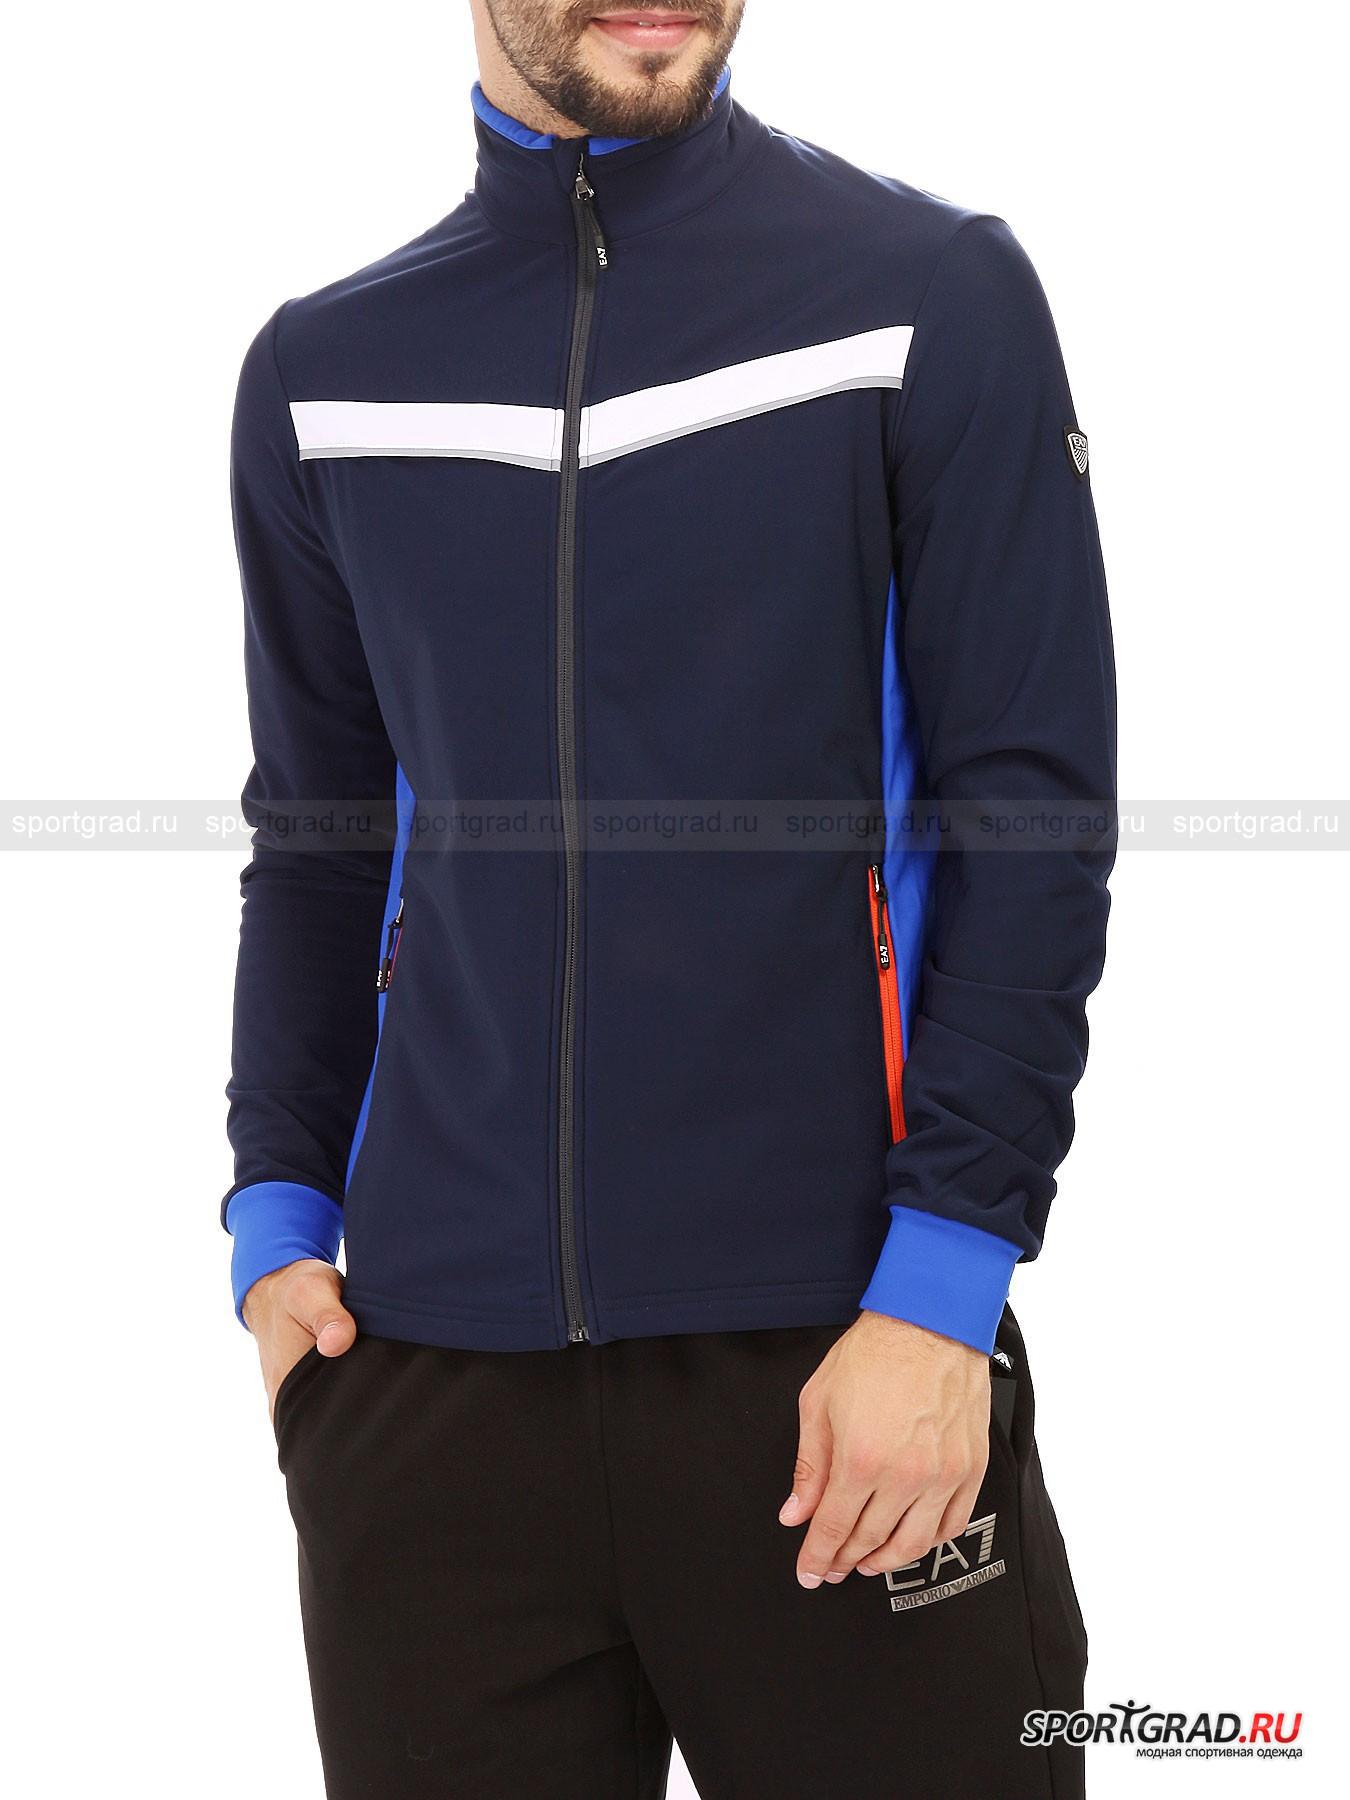 ��������� ������� ����������� Ski Full Zip Sweatshirt EMPORIO ARMANI